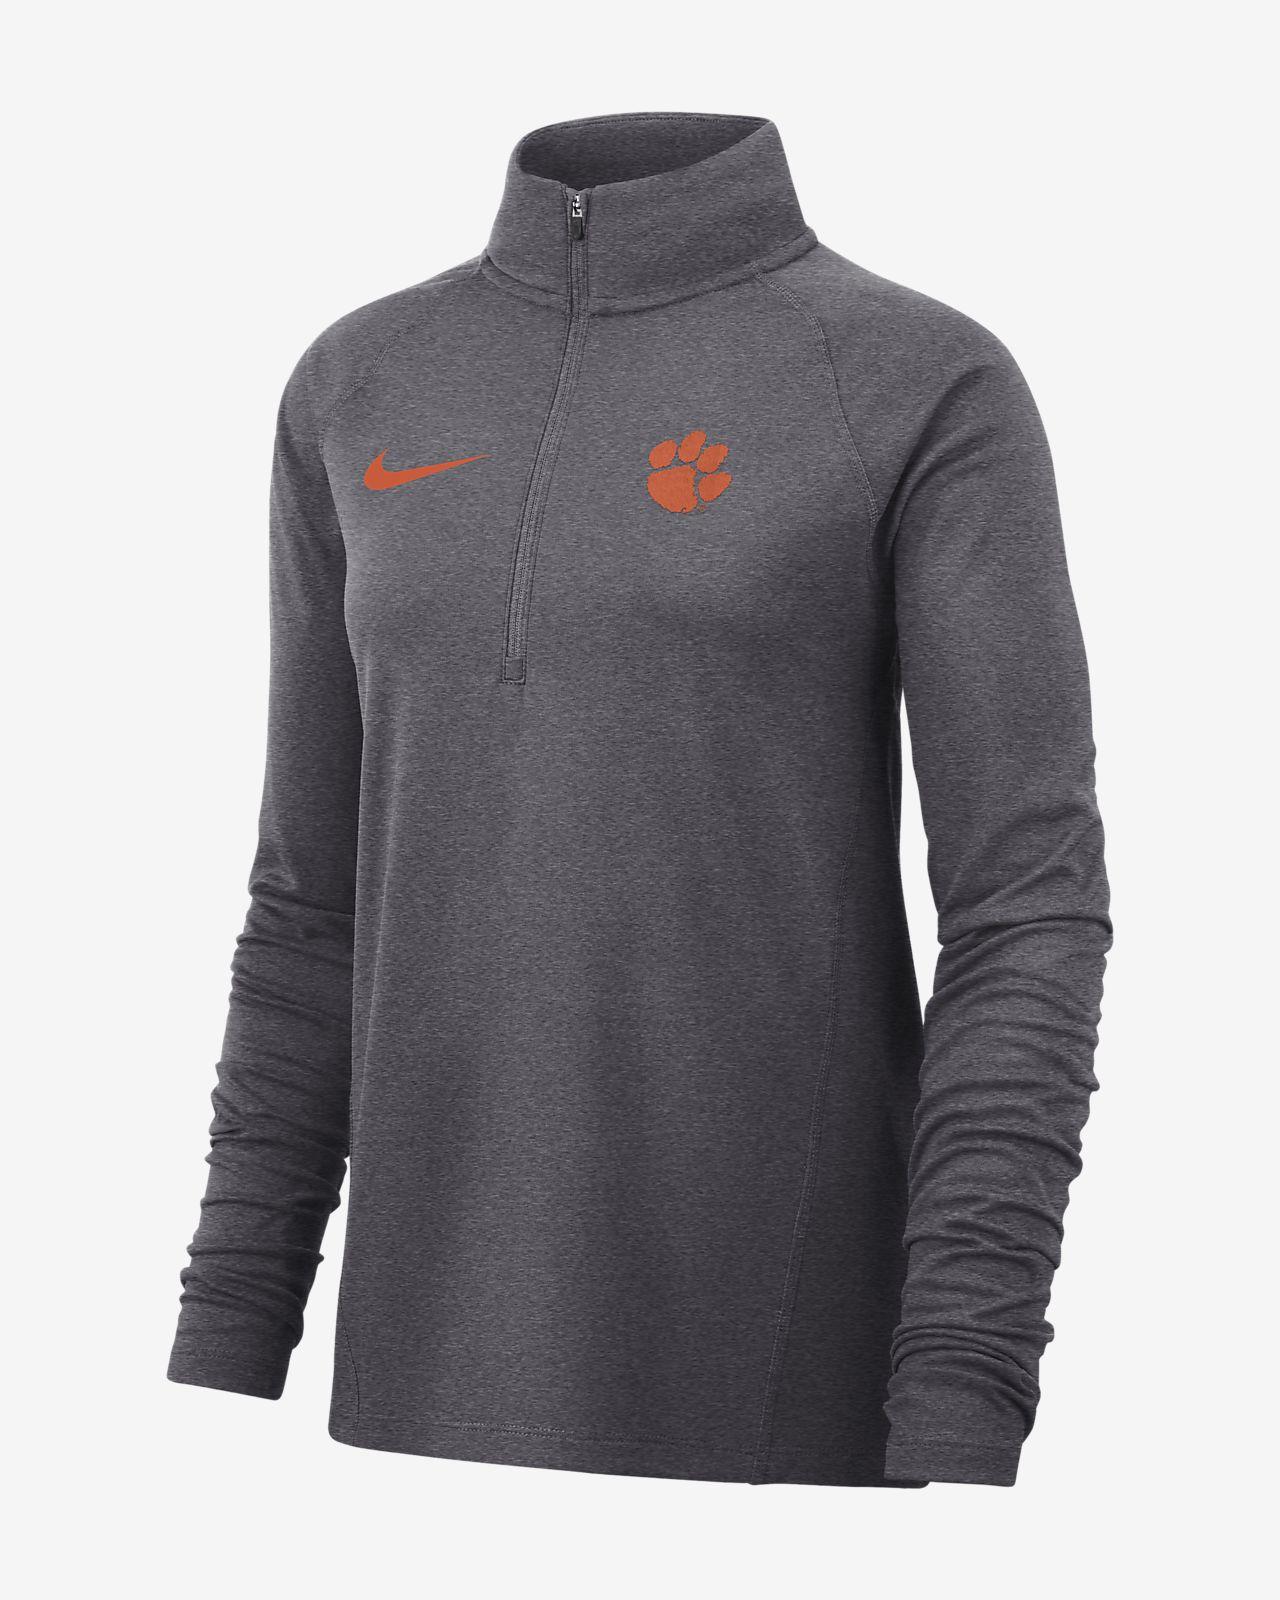 Nike College Therma (Clemson) Women's Long-Sleeve 1/2-Zip Top